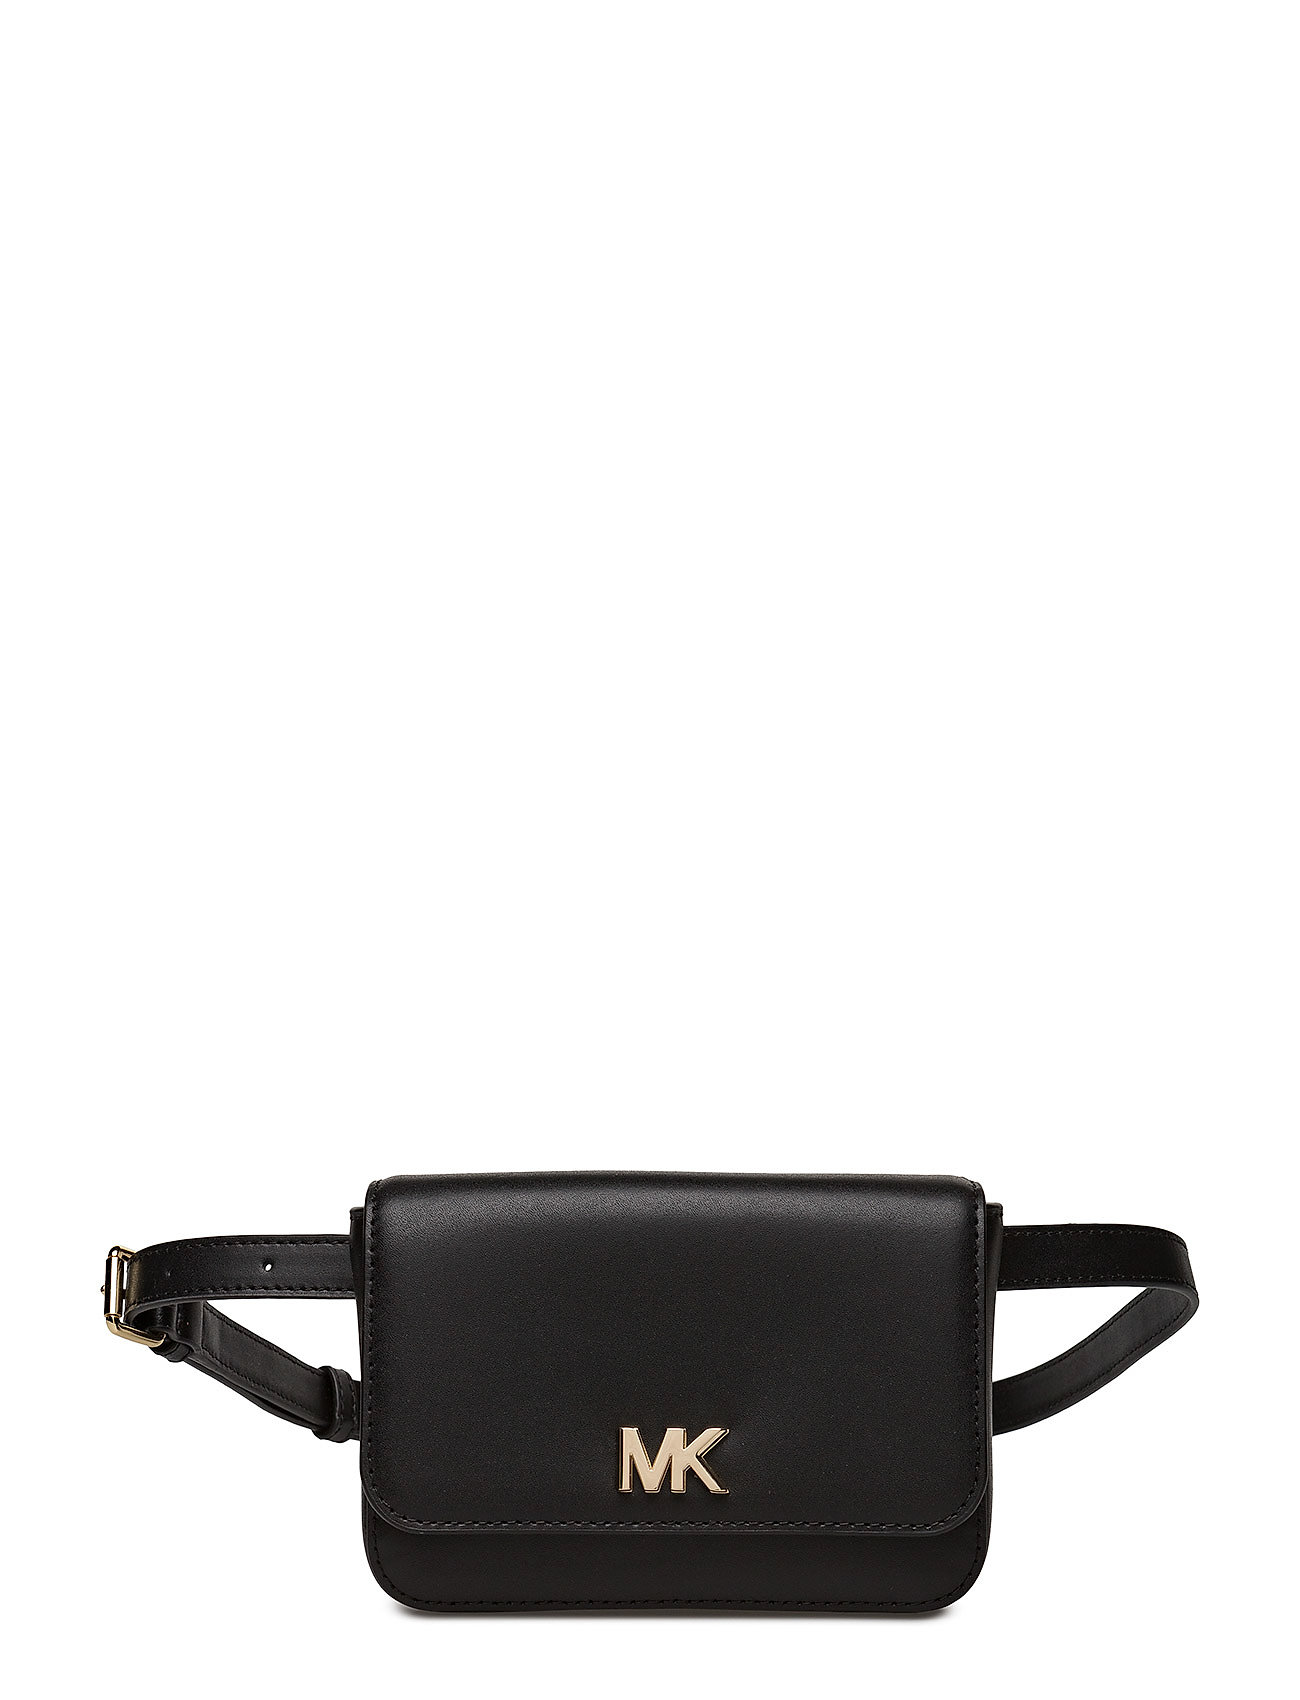 4475aea62015c Mott Belt Bag (Black) (£95) - Michael Kors Bags -